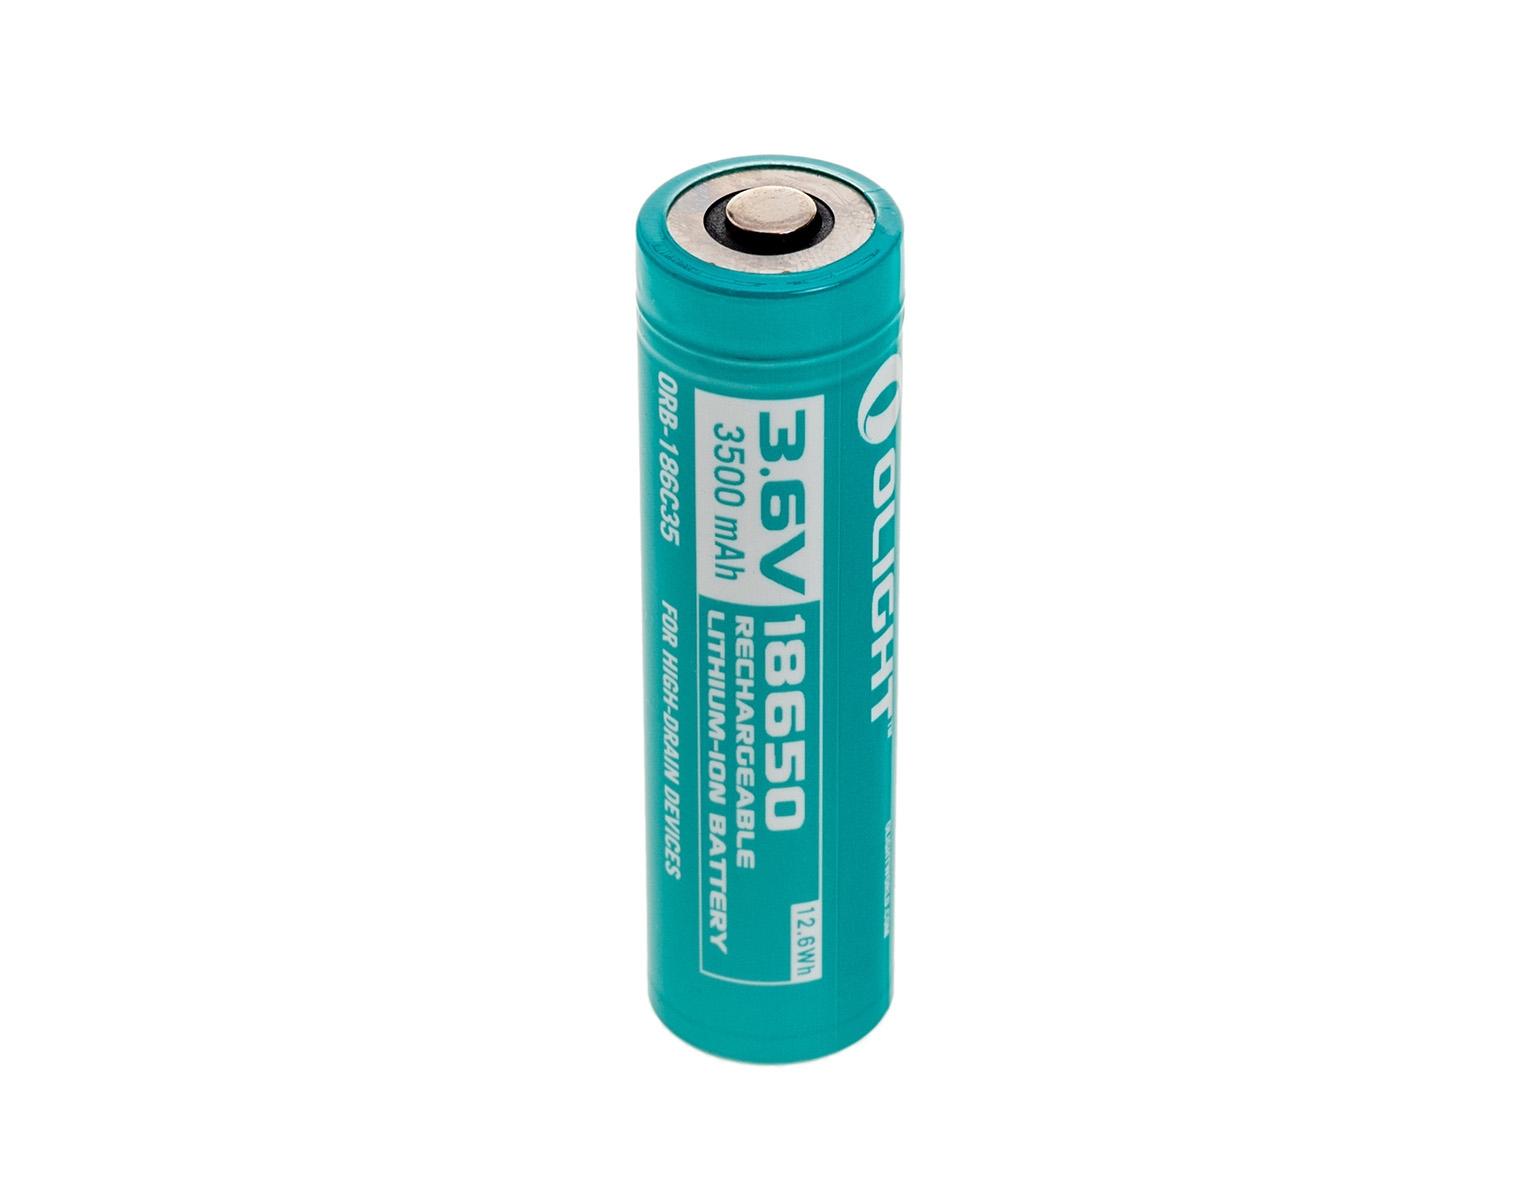 Image of Akumulator 3,6v olight 18650 do latarki s30r - 3500 mah (orb-186c35)